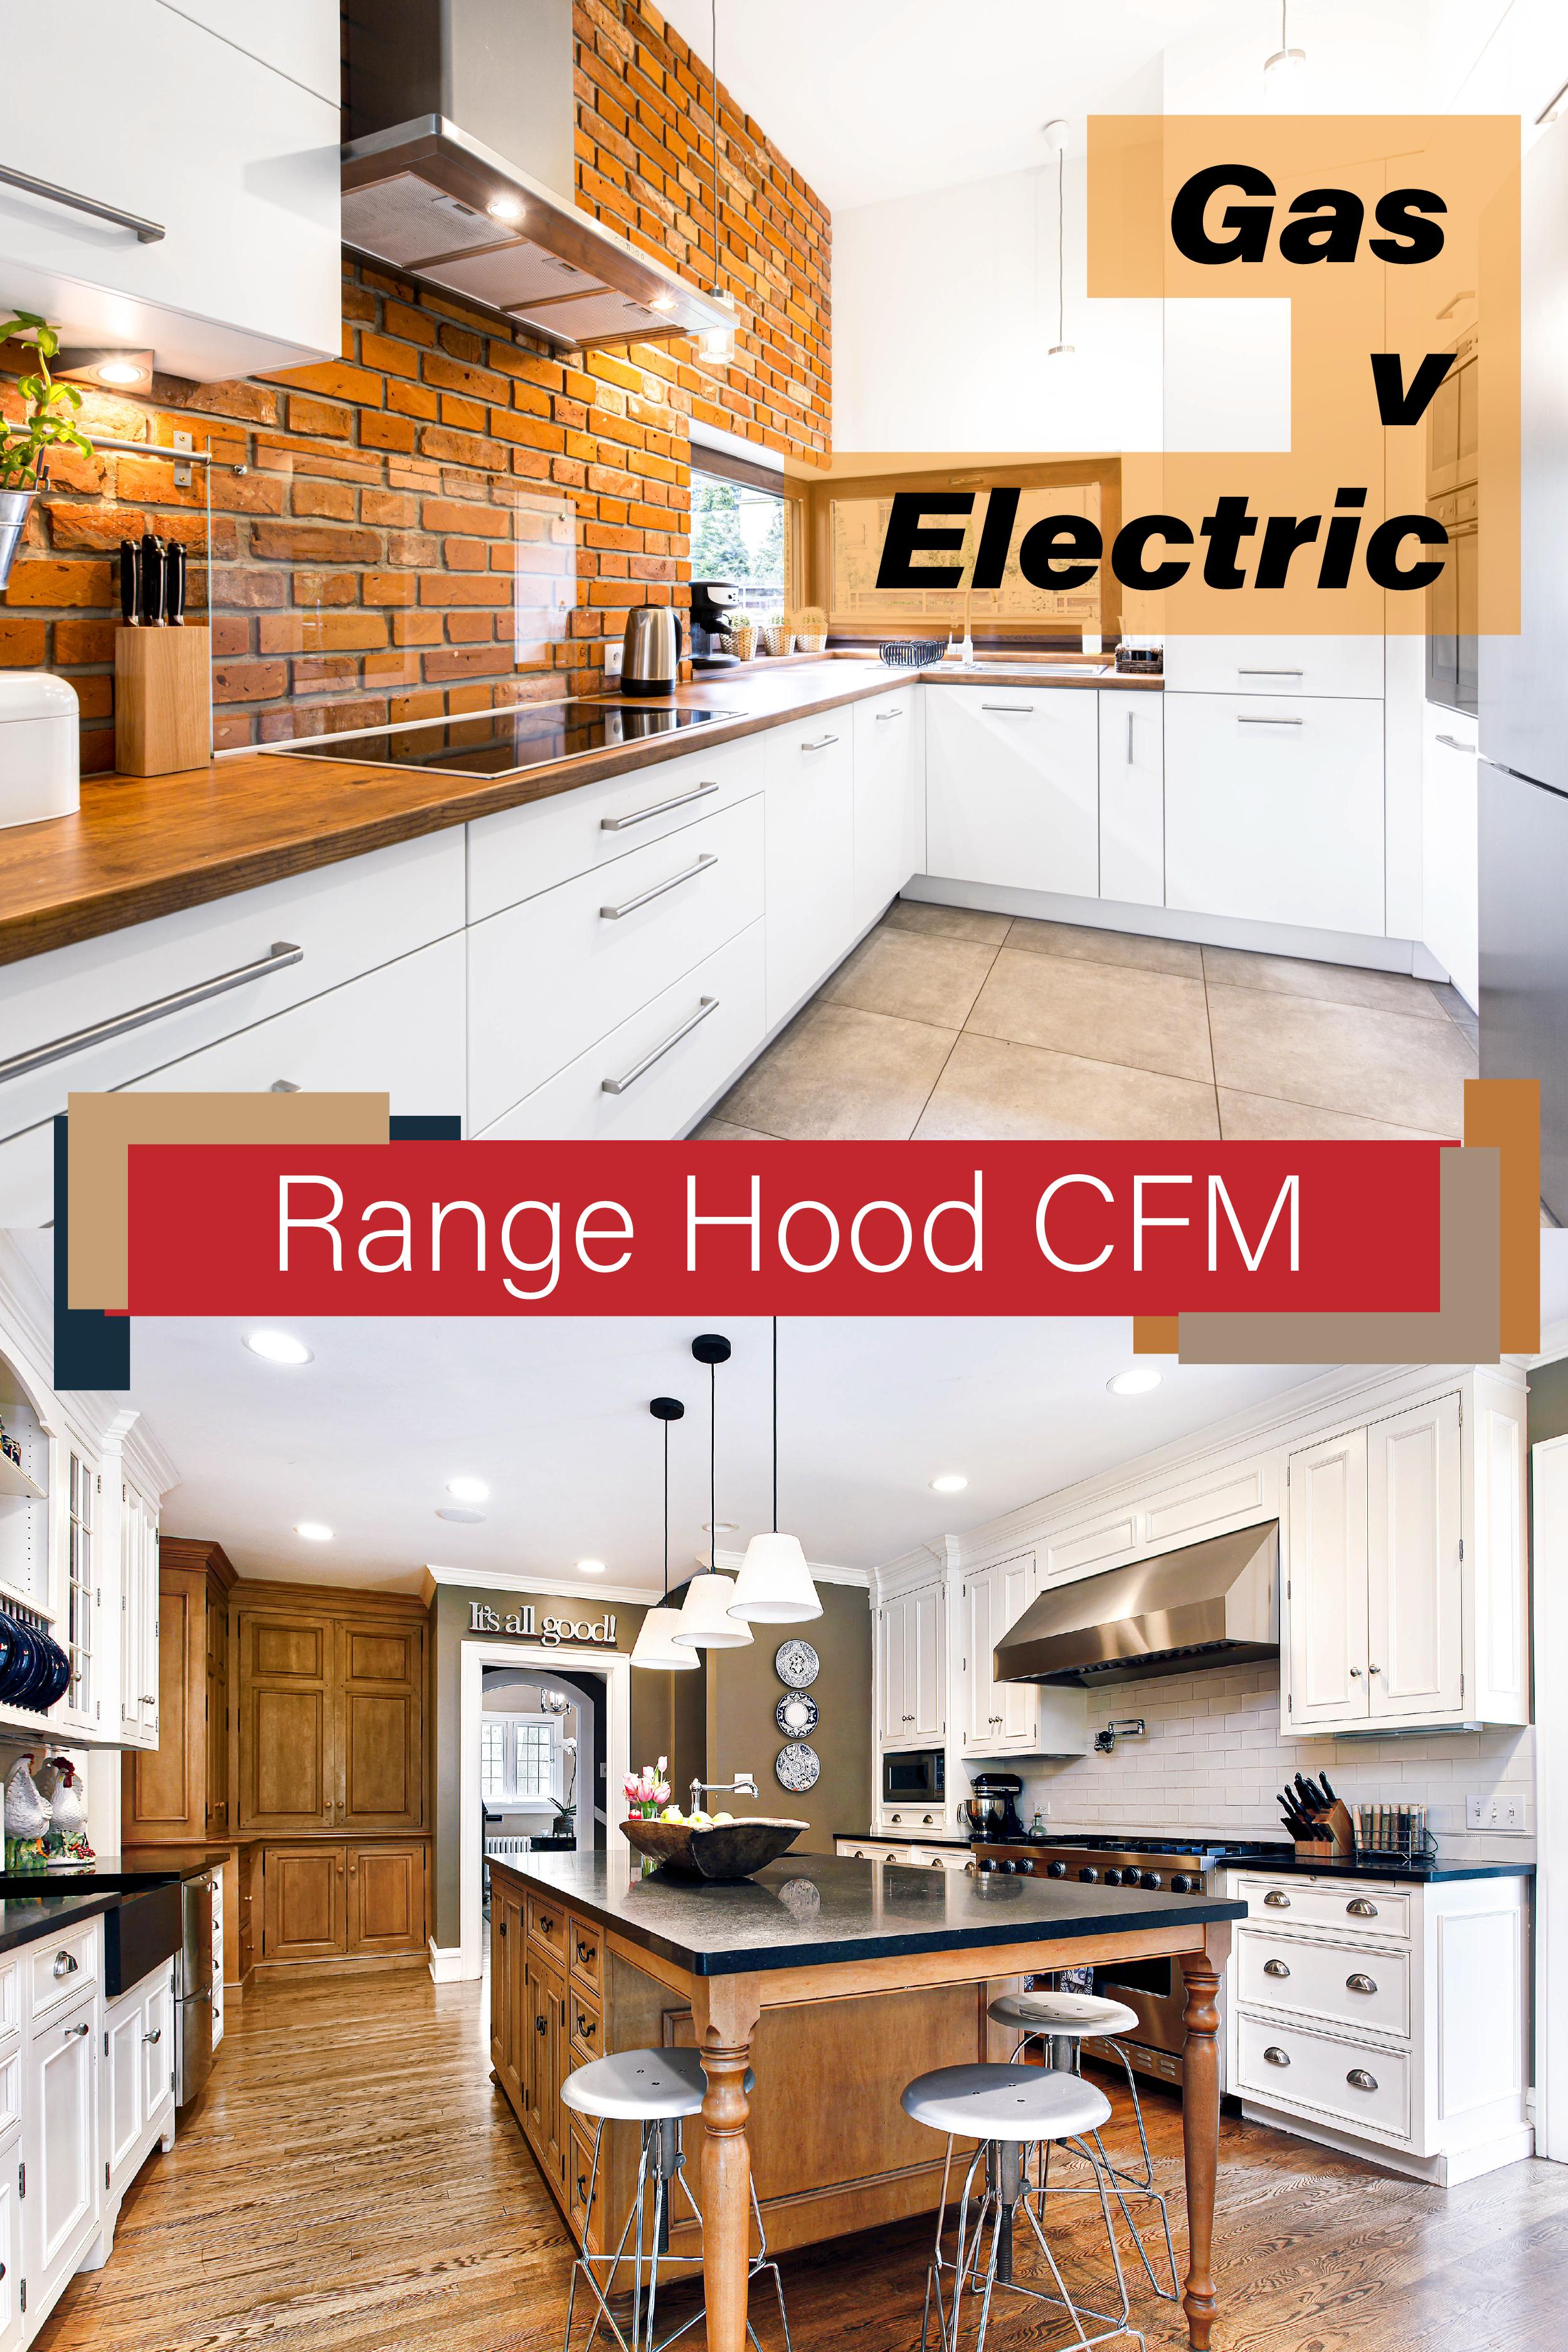 Range Hood Cfm For Electric Vs Gas Cooktops Range Hood Kitchen Stove Cooktop